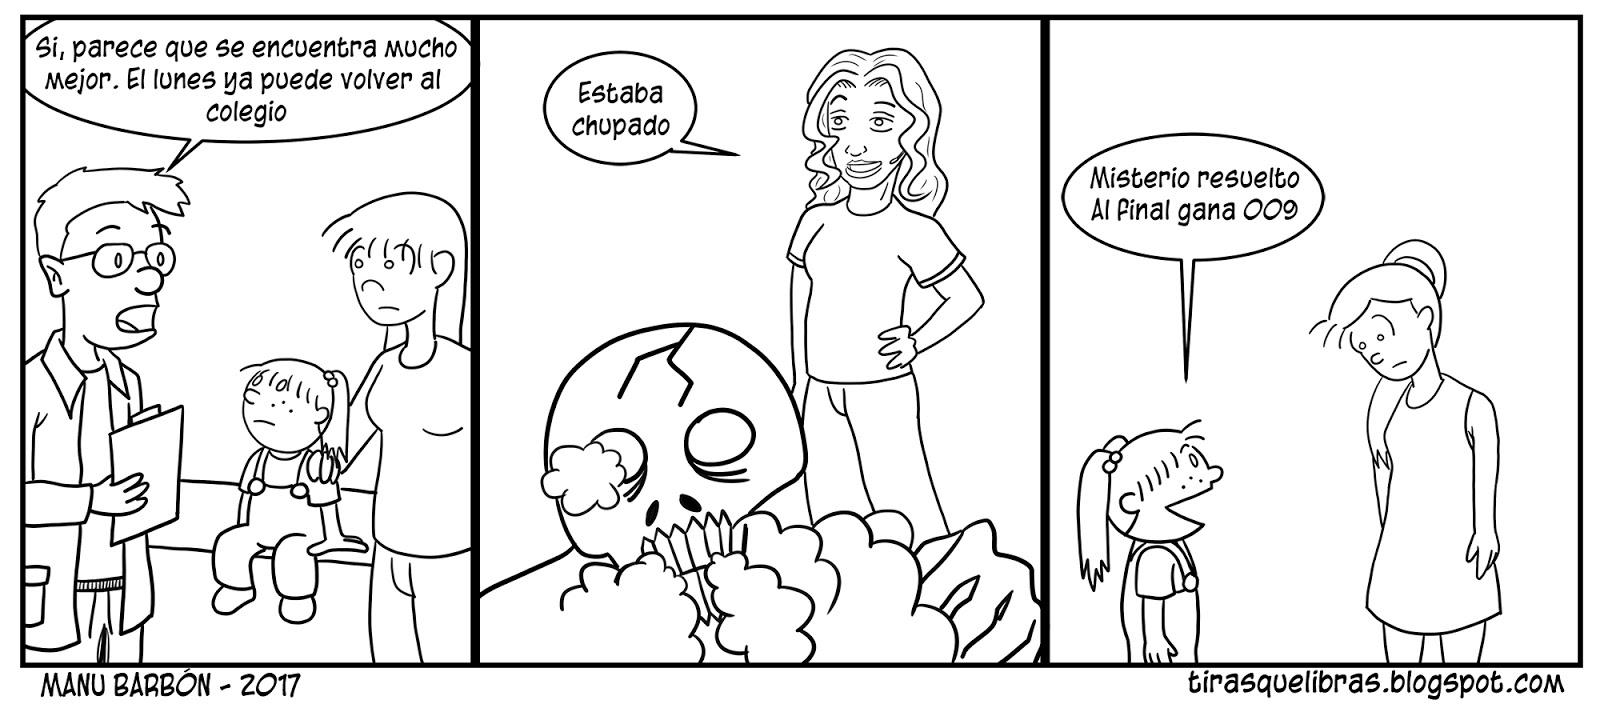 webcomic Jen. El desenlace del duelo